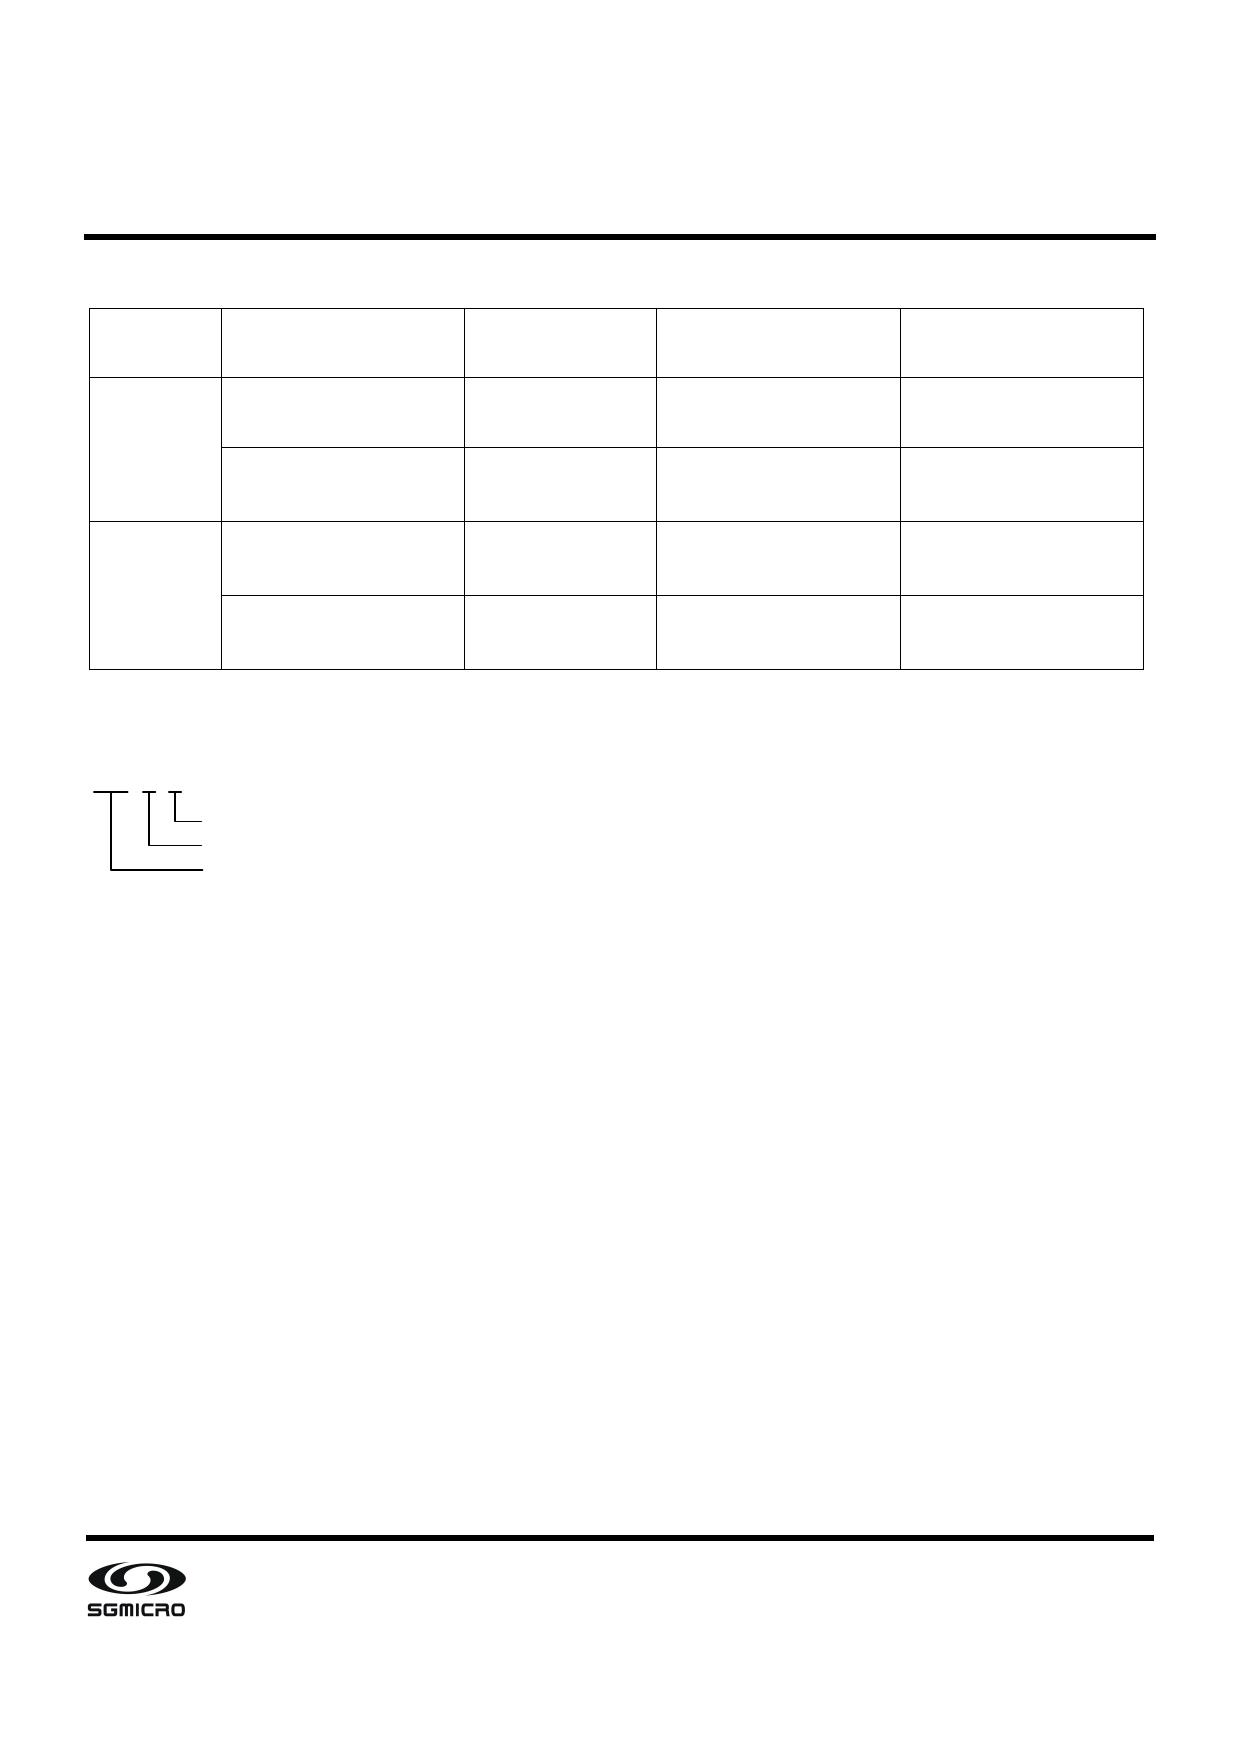 SGM8942 pdf, schematic